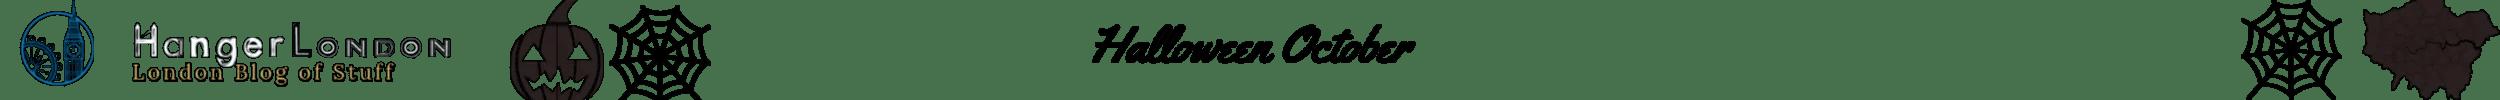 the london blog of stuff Halloween month